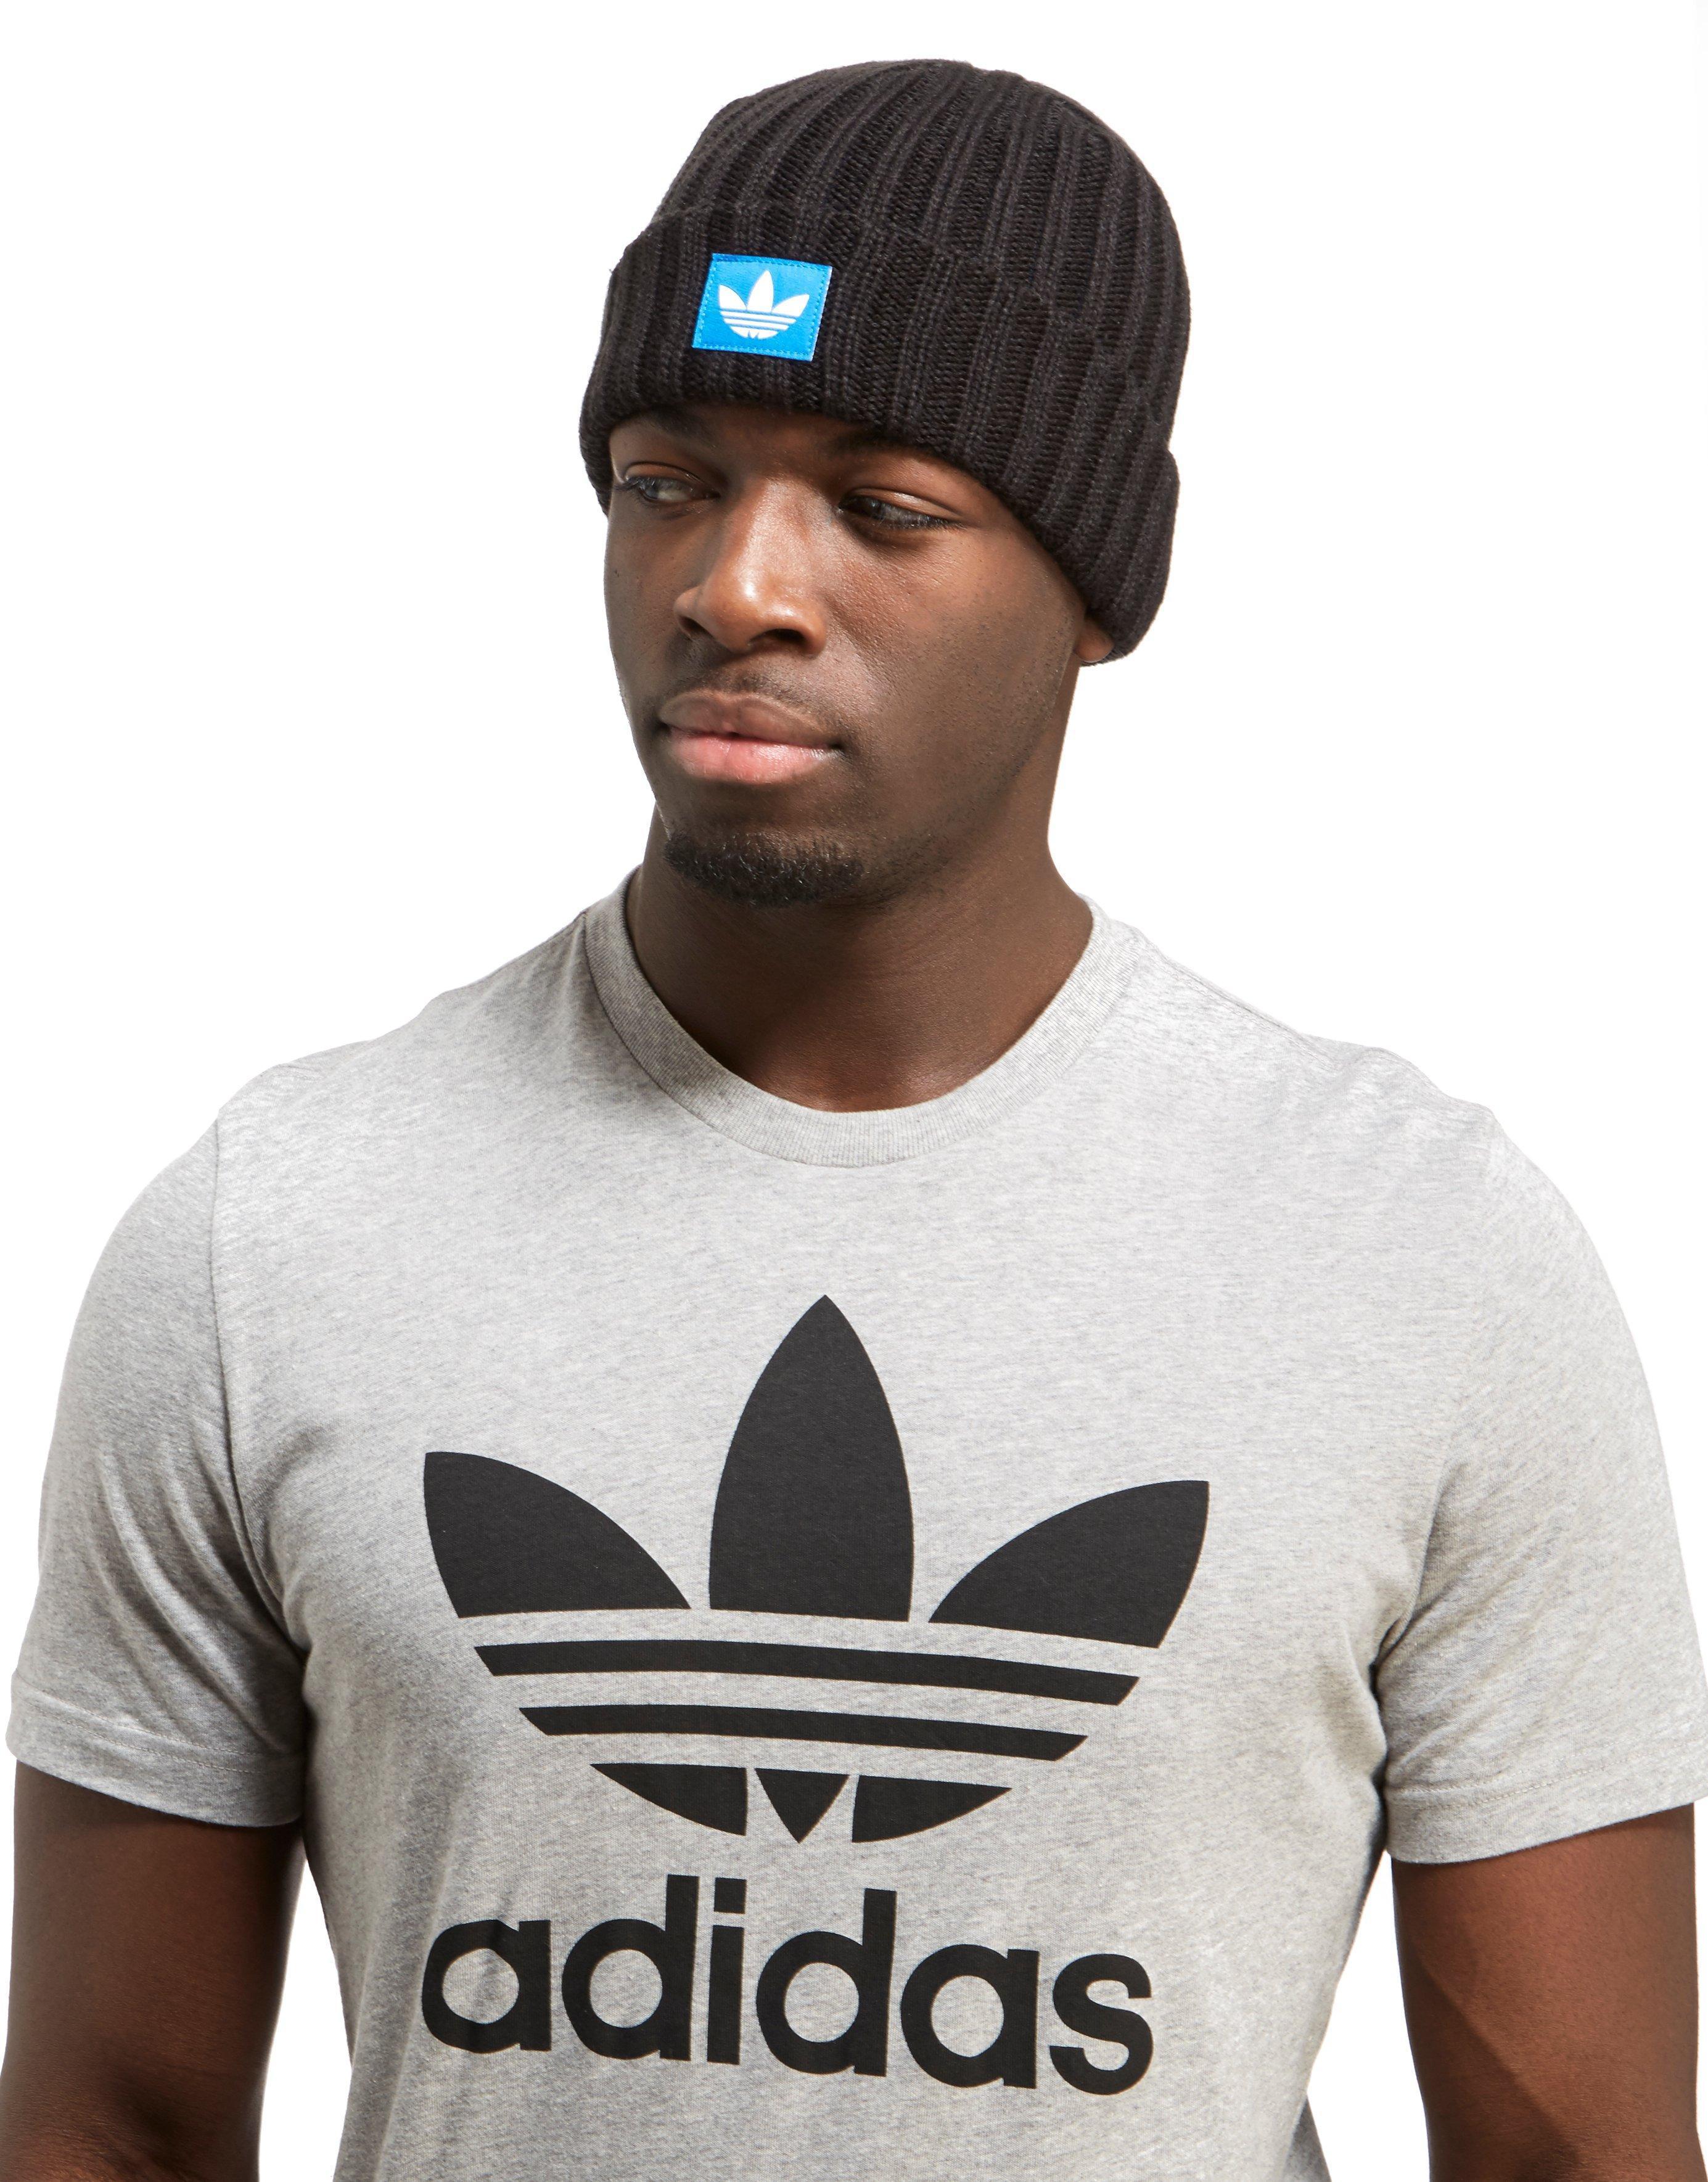 adidas Originals Trefoil Fisherman Beanie in Black for Men - Lyst c92cbf4d16b